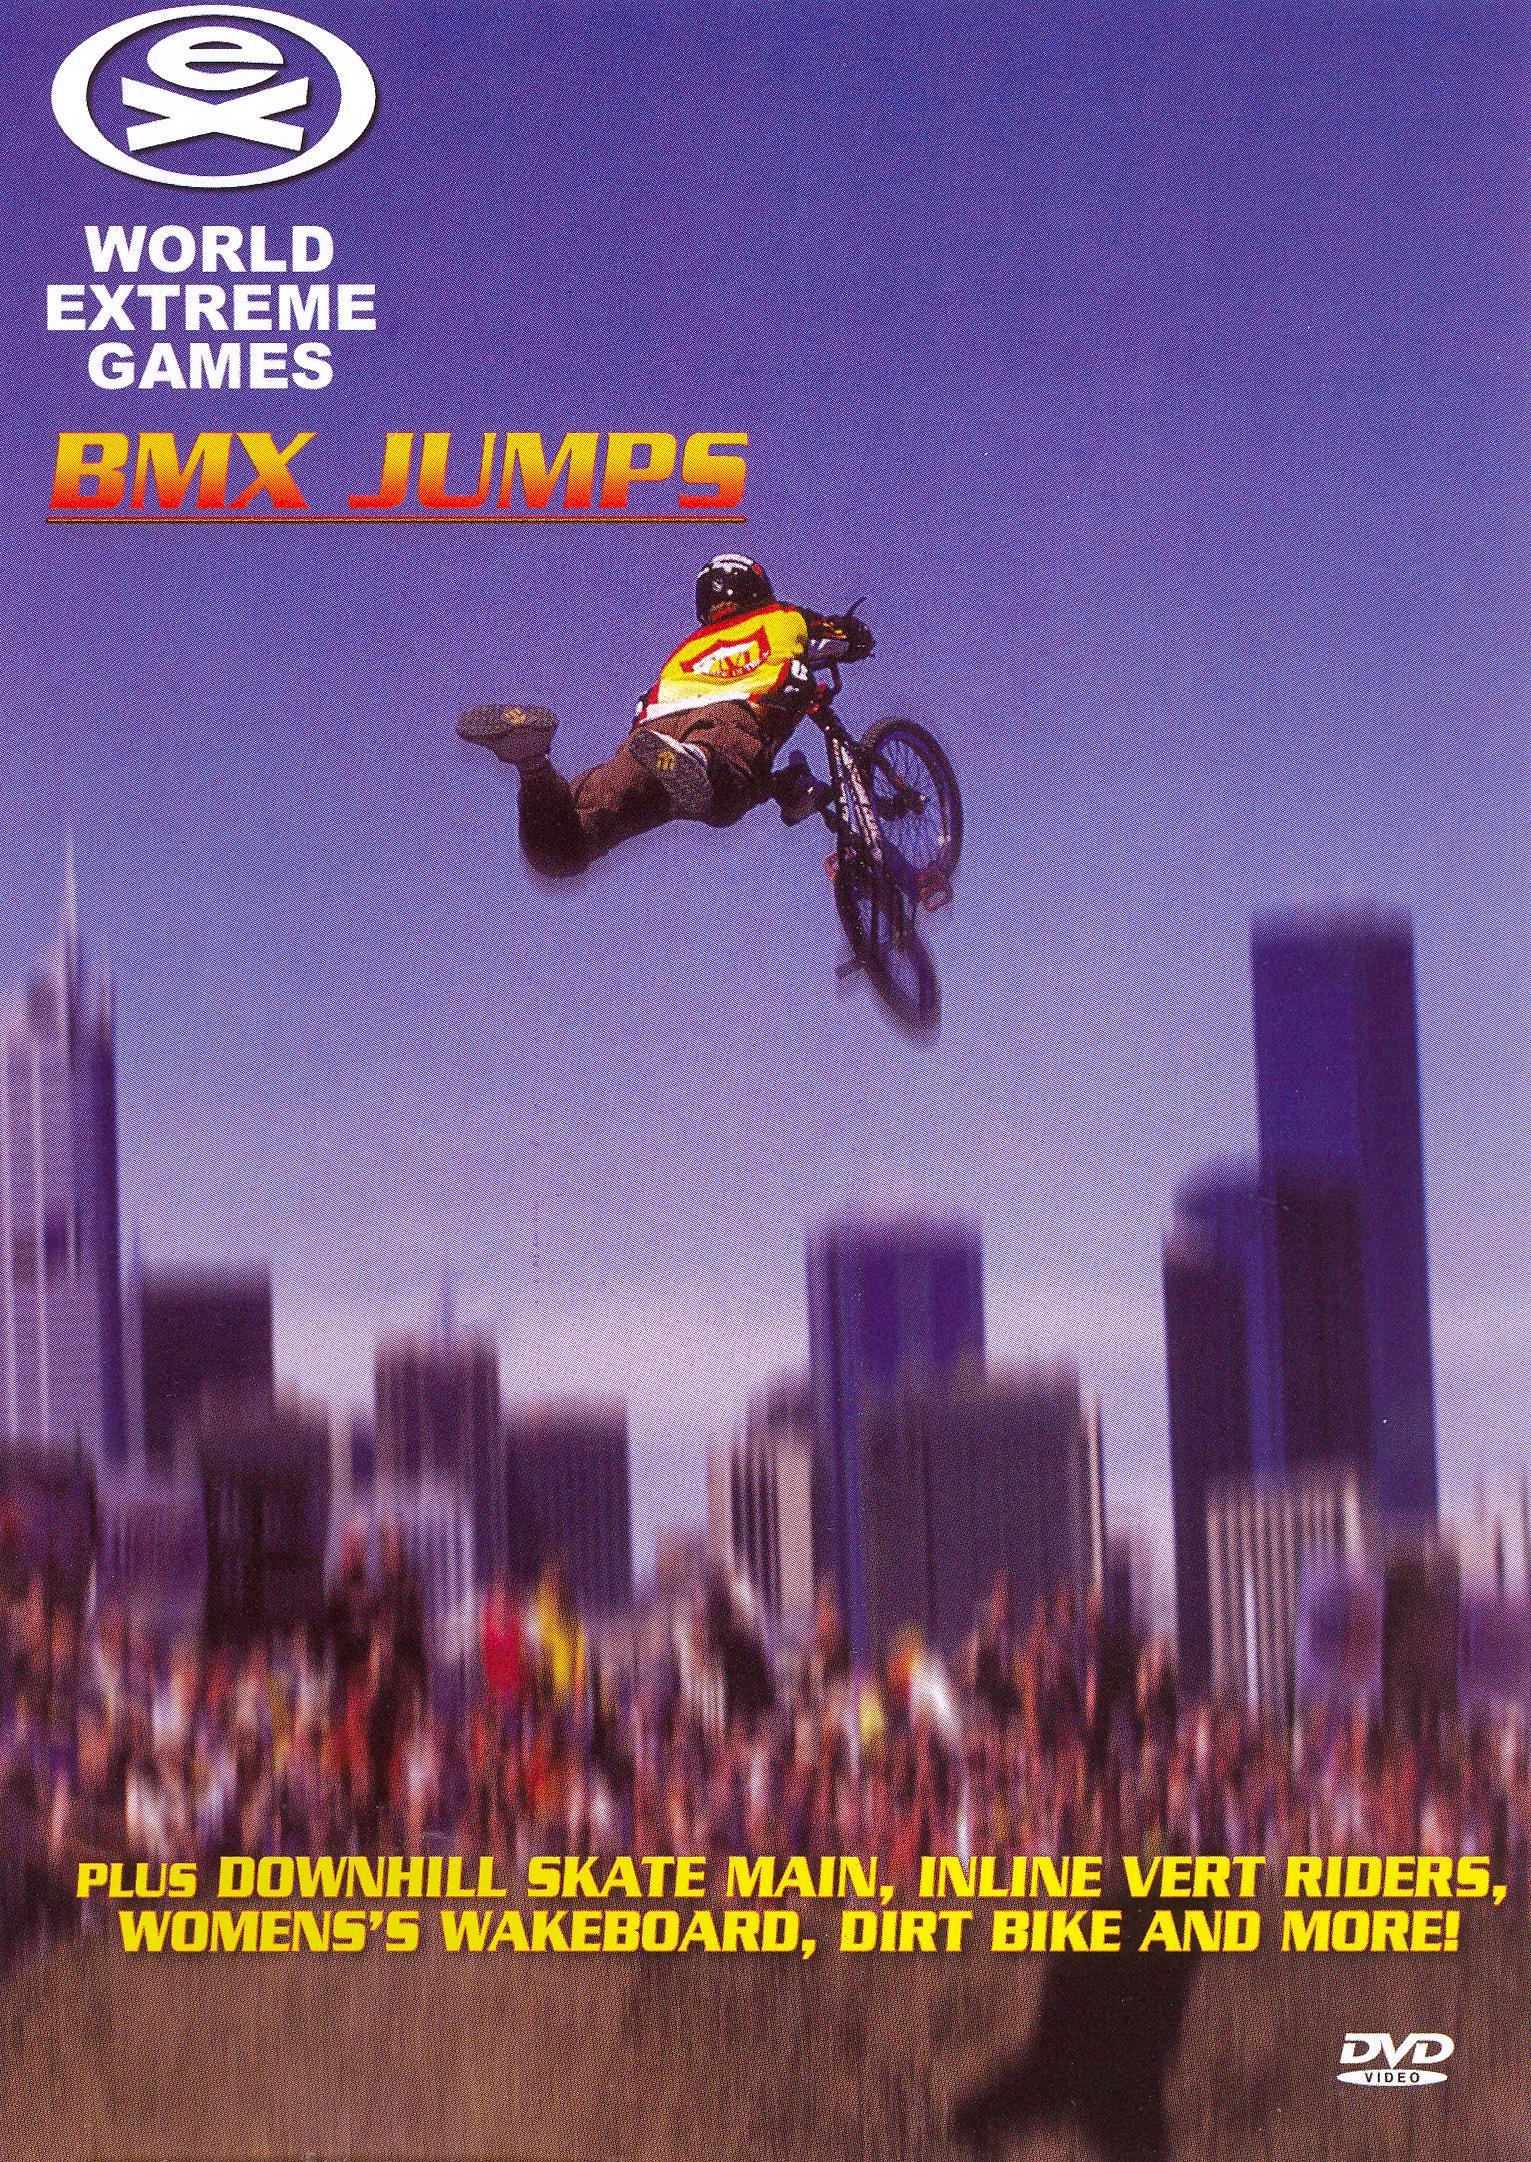 World Extreme Games, Vol. 3